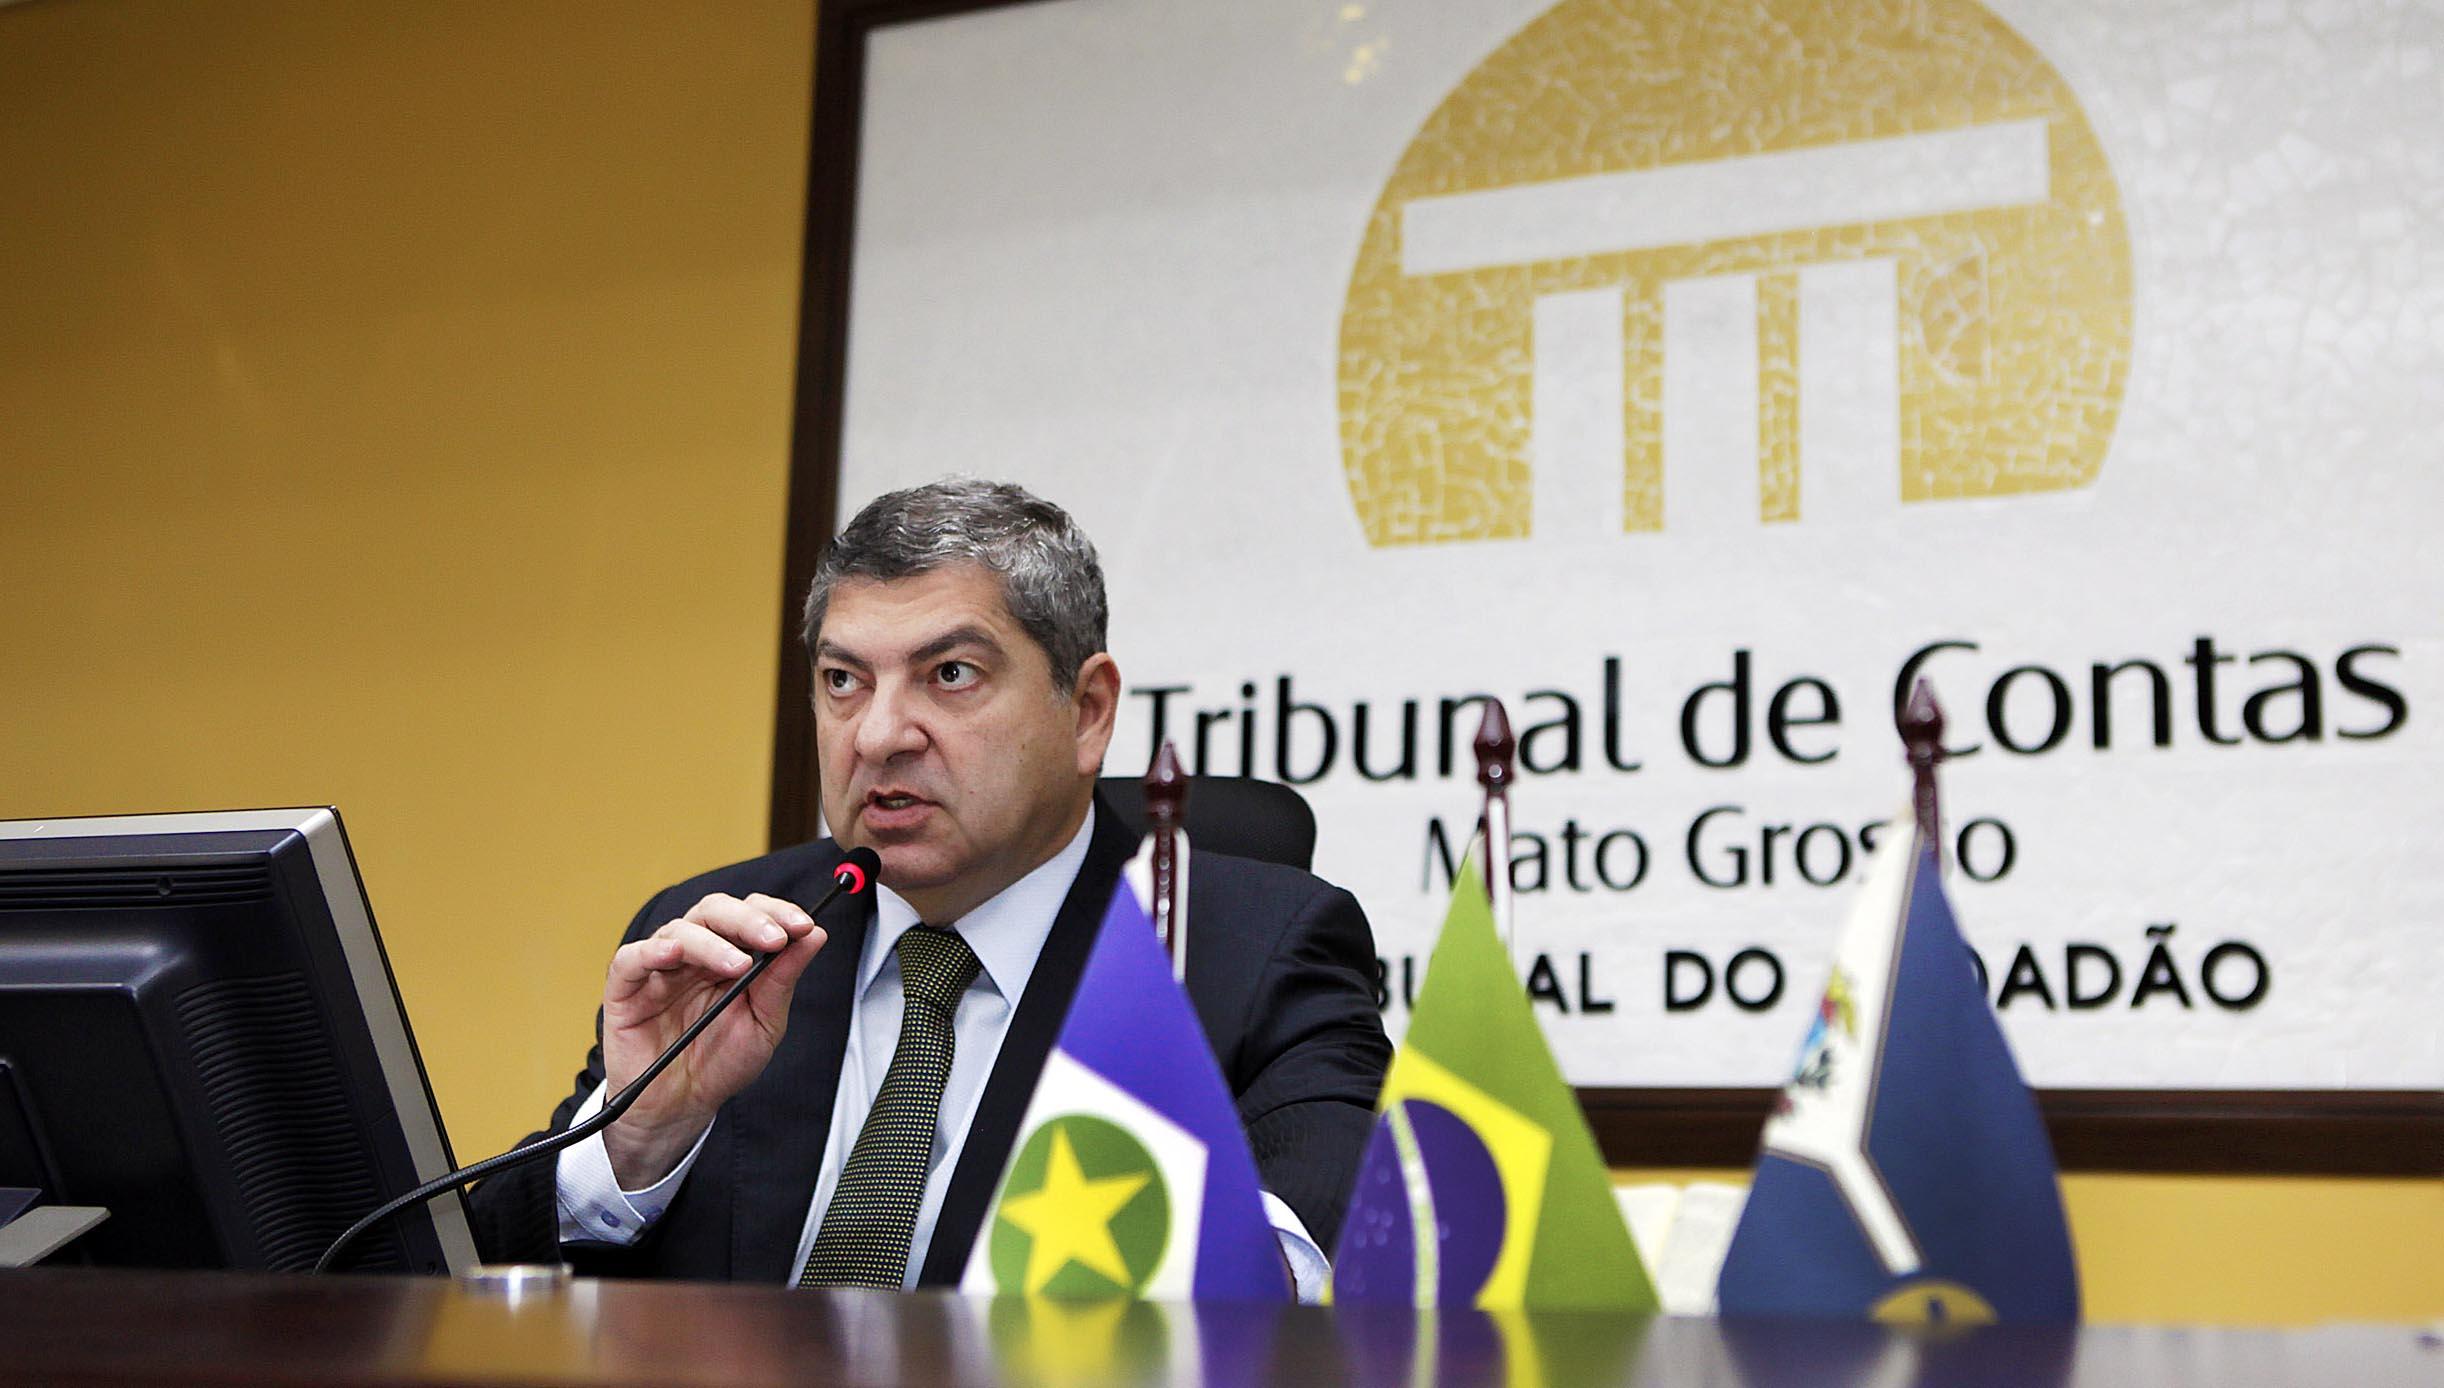 Conselheiro do TCE-MT - Guilherme Antonio Maluf